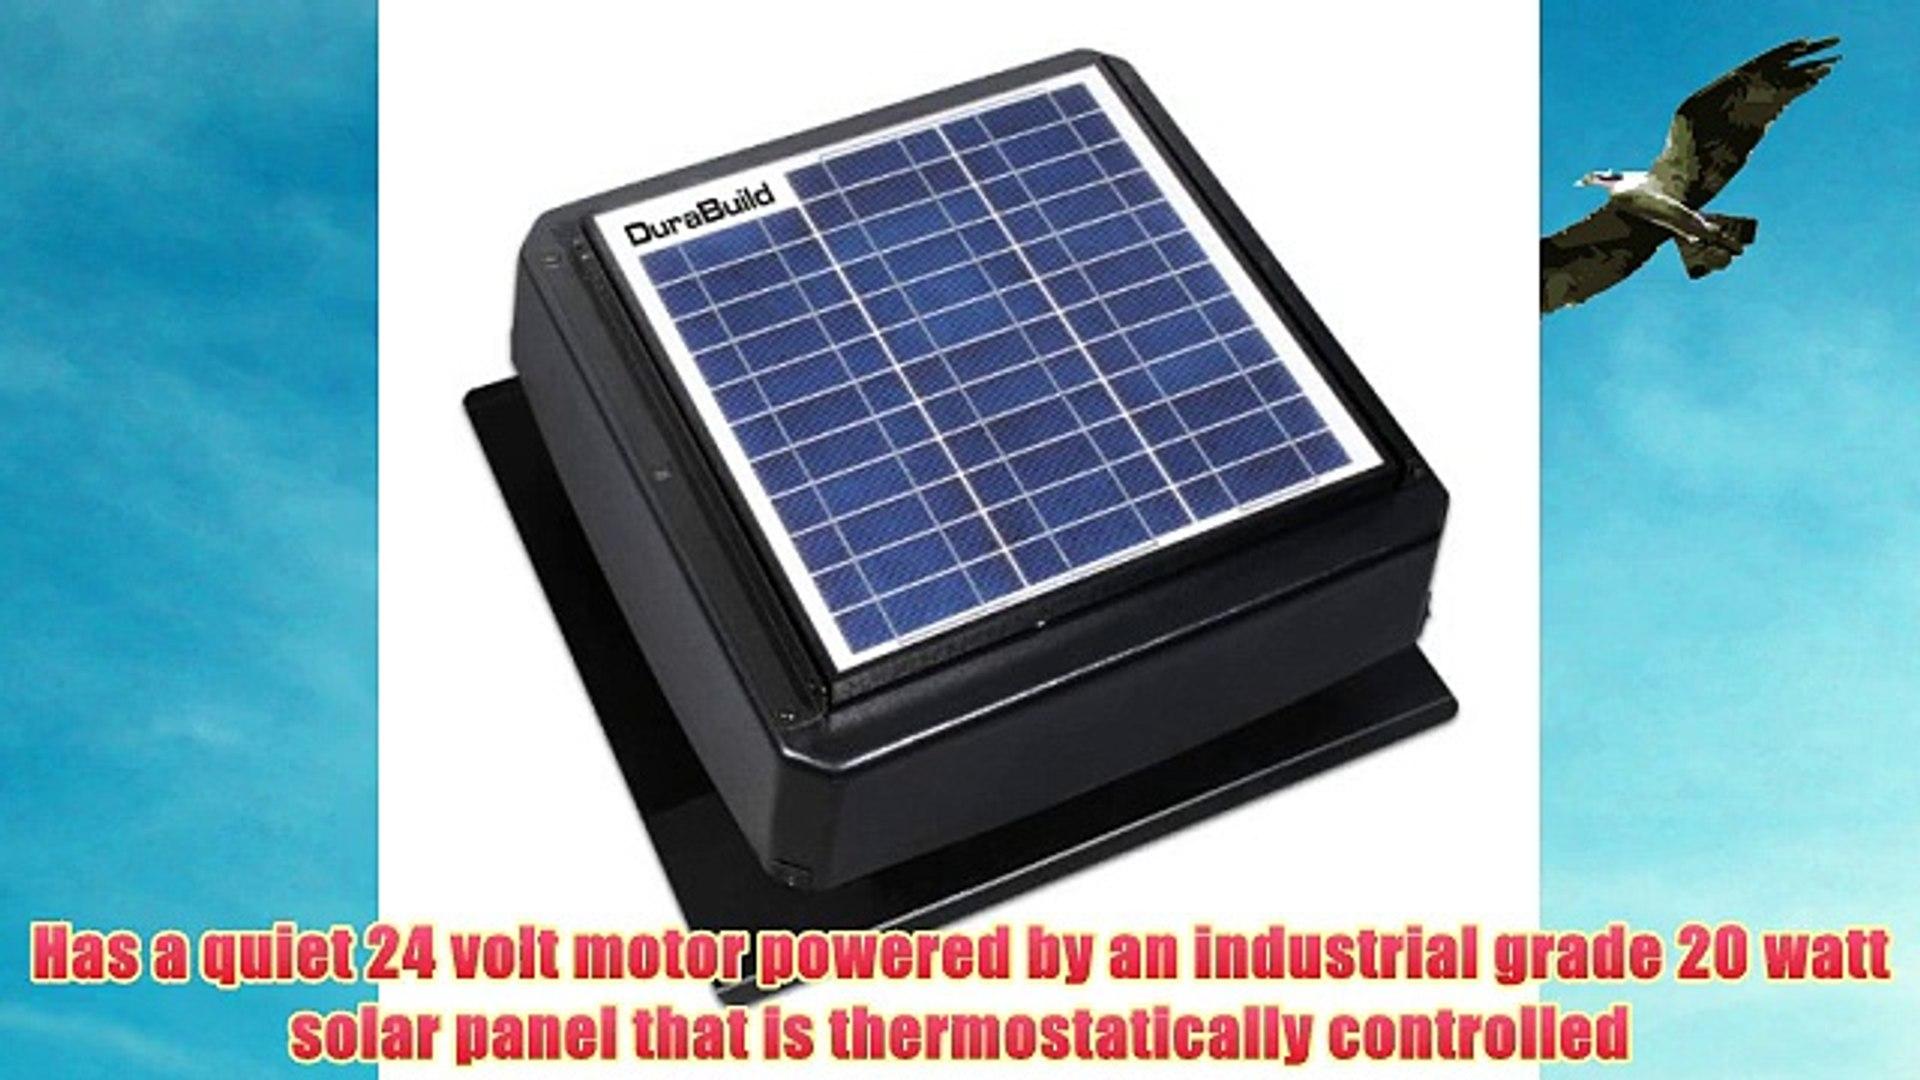 Durabuild 527S-DUB-106-BLK Roof Mount Solar Powered Attic Fan 20-watt